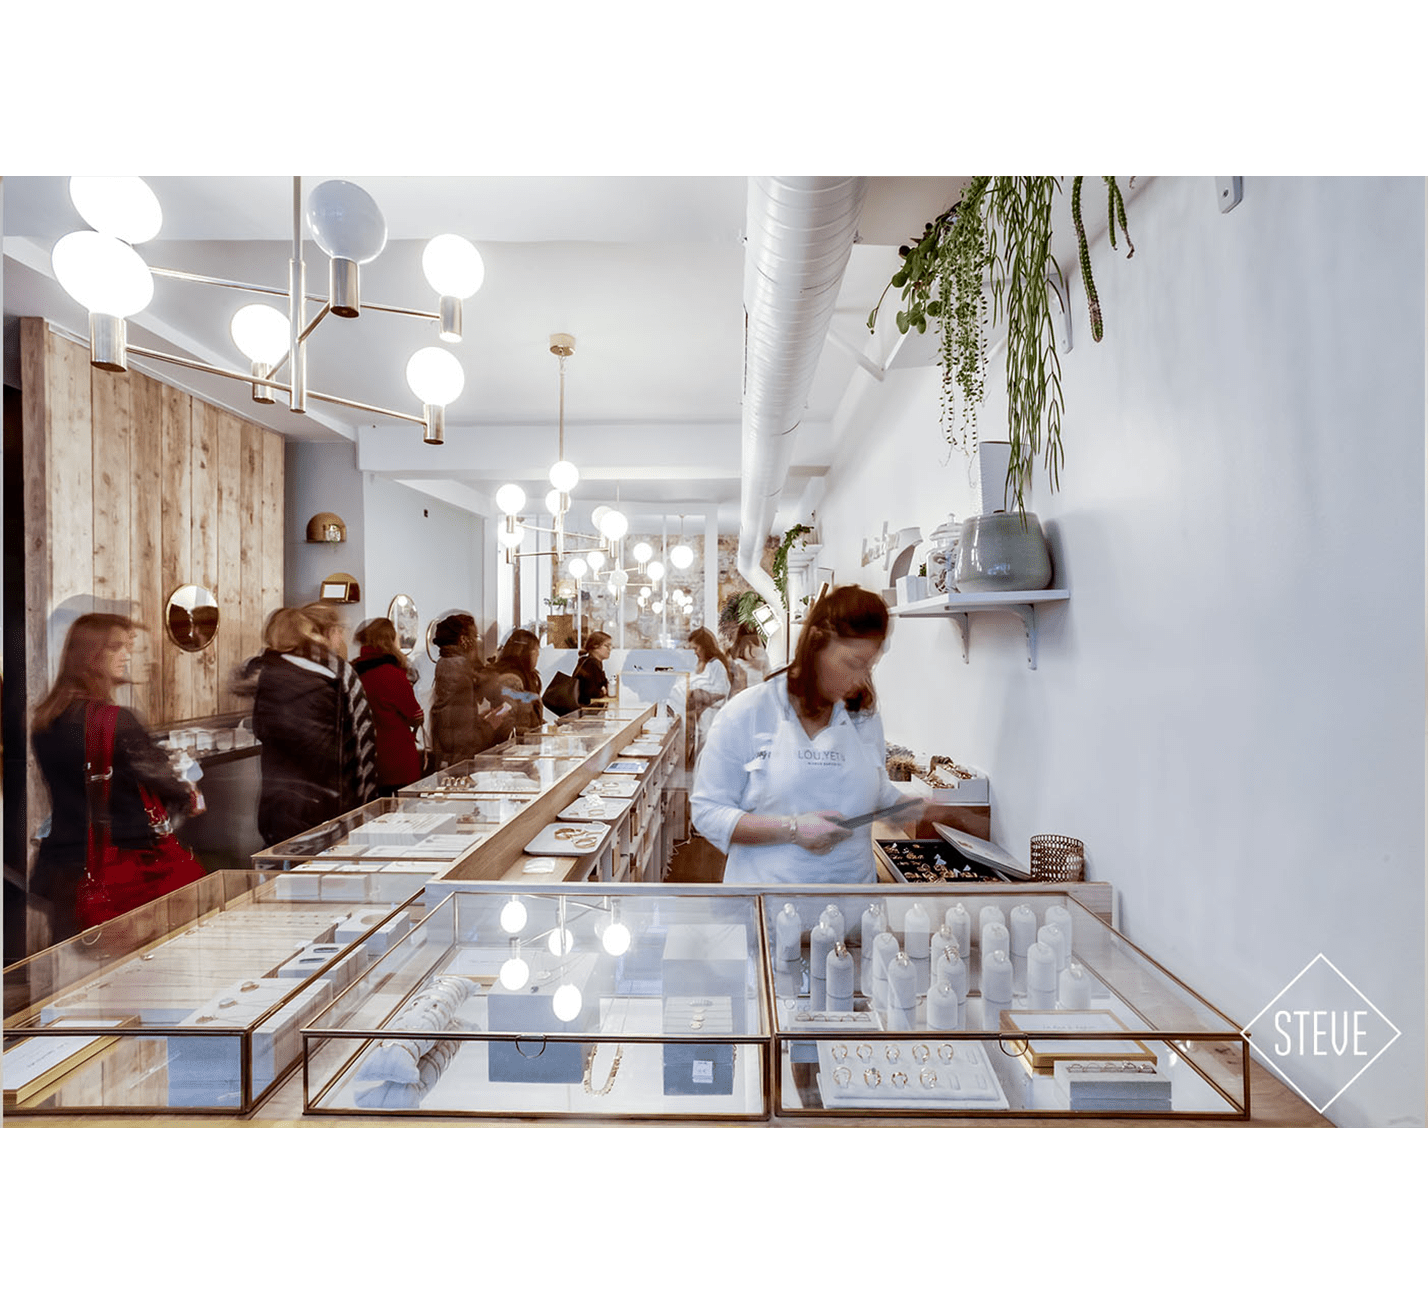 Projet-Lou-Yetu-Atelier-Steve-Pauline-Borgia-Architecture-interieur-06-min